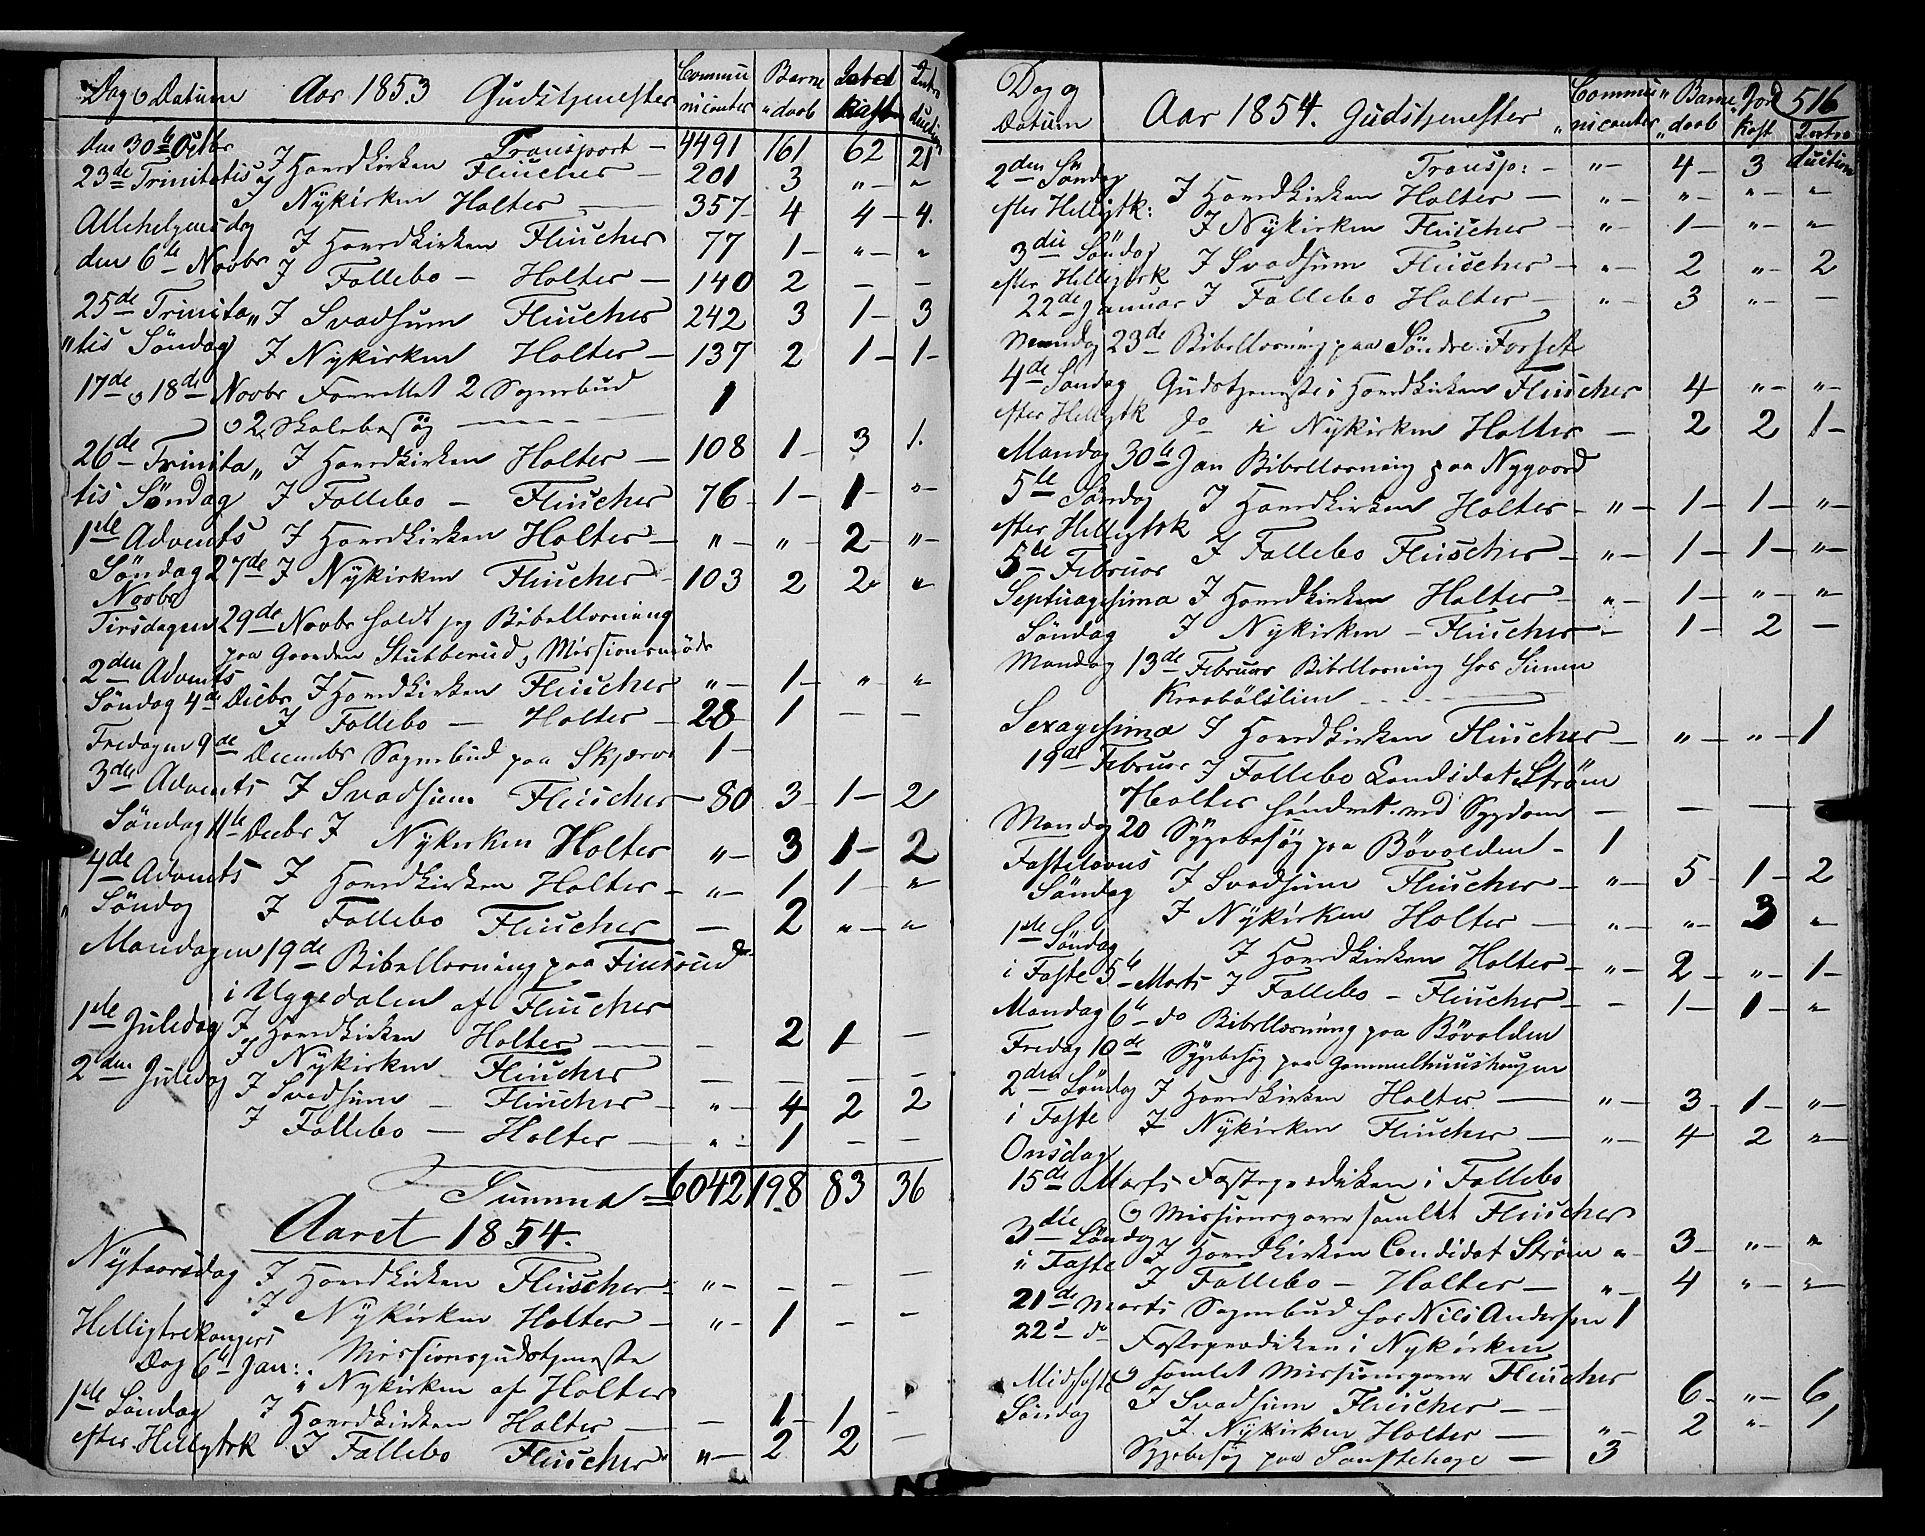 SAH, Gausdal prestekontor, Ministerialbok nr. 8, 1850-1861, s. 516